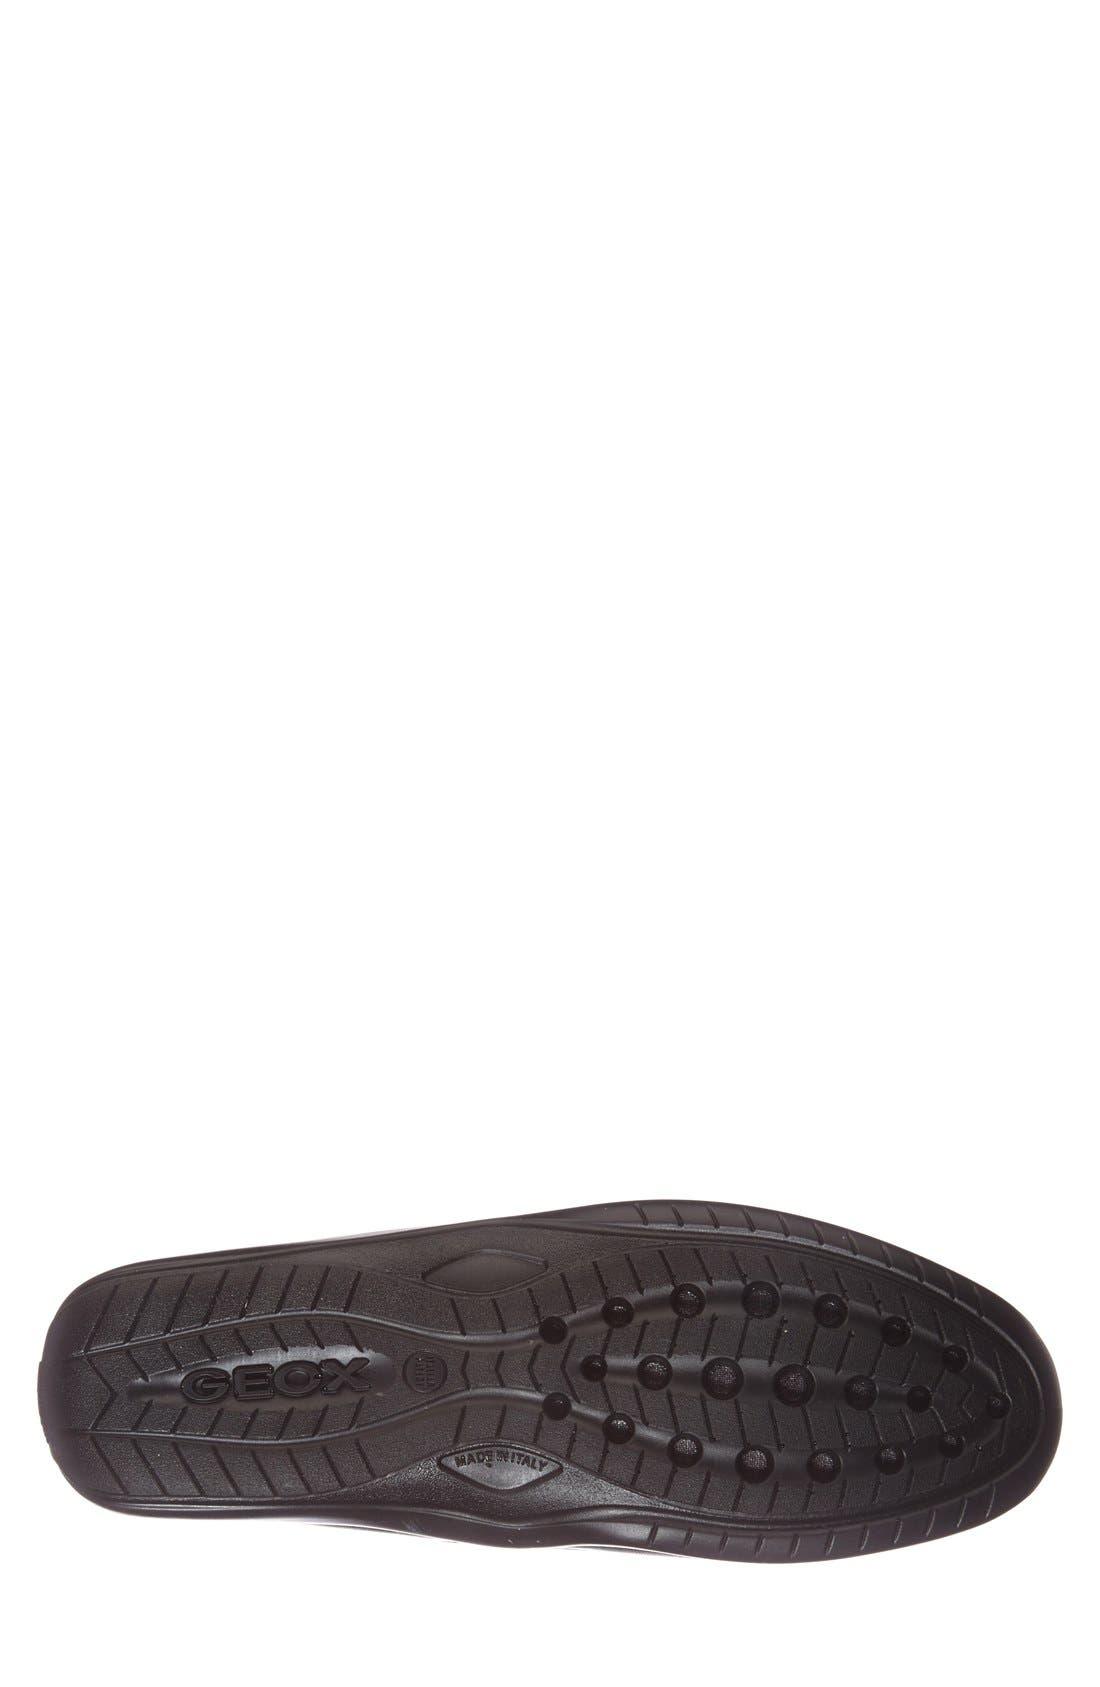 Alternate Image 4  - Geox 'U Xense Mox' Driving Shoe (Men)